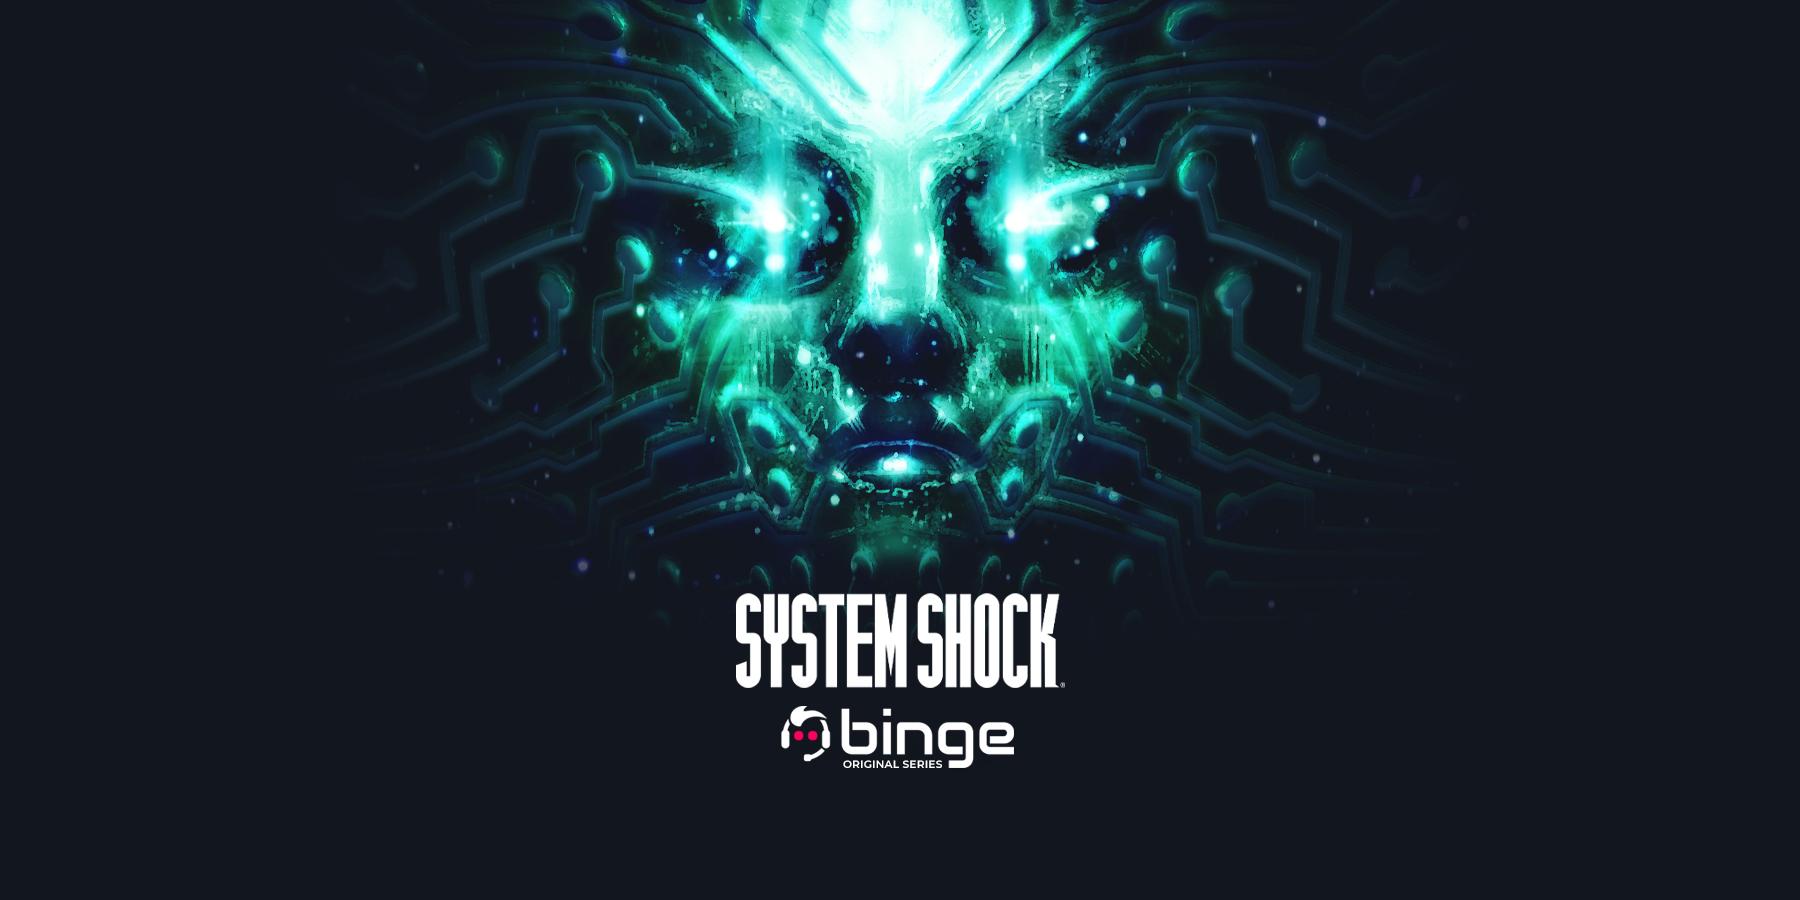 system shock binge.jpg